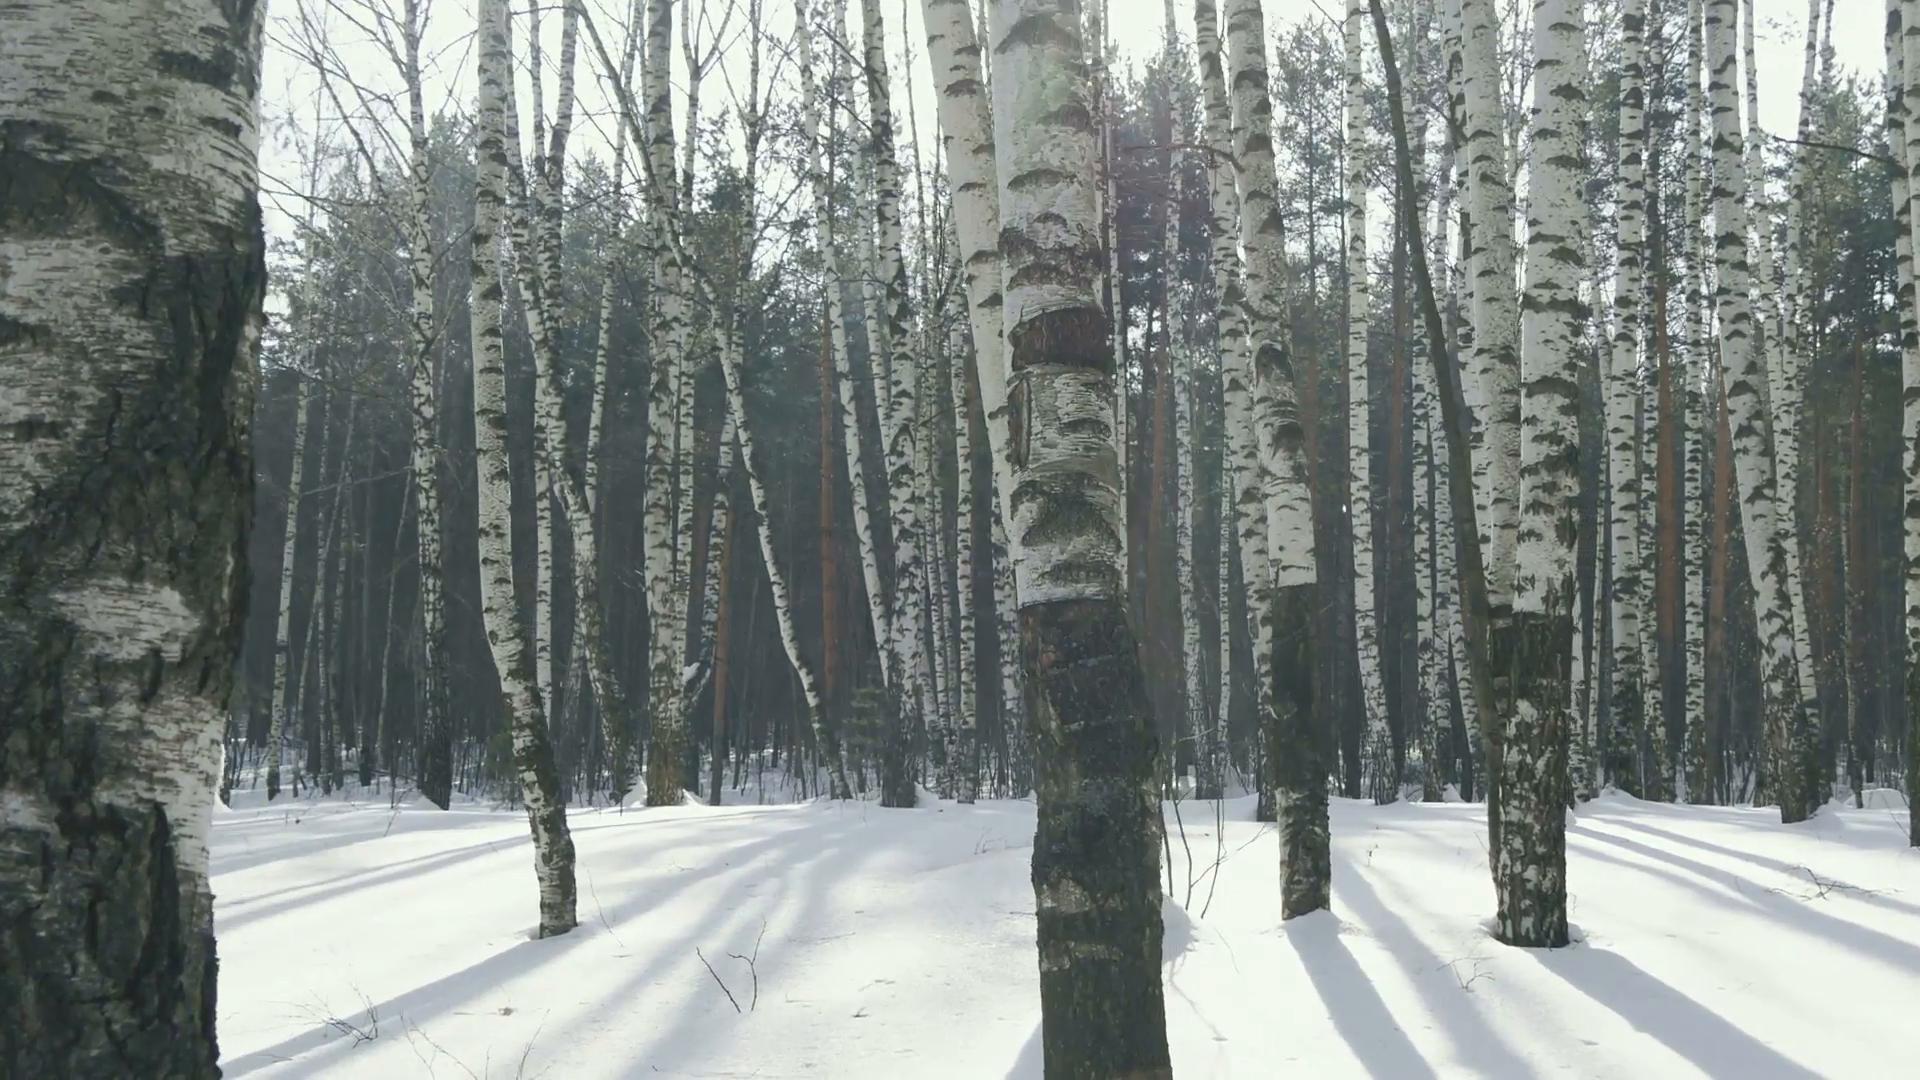 Birch trees in winter forest, Russia Stock Video Footage - Videoblocks